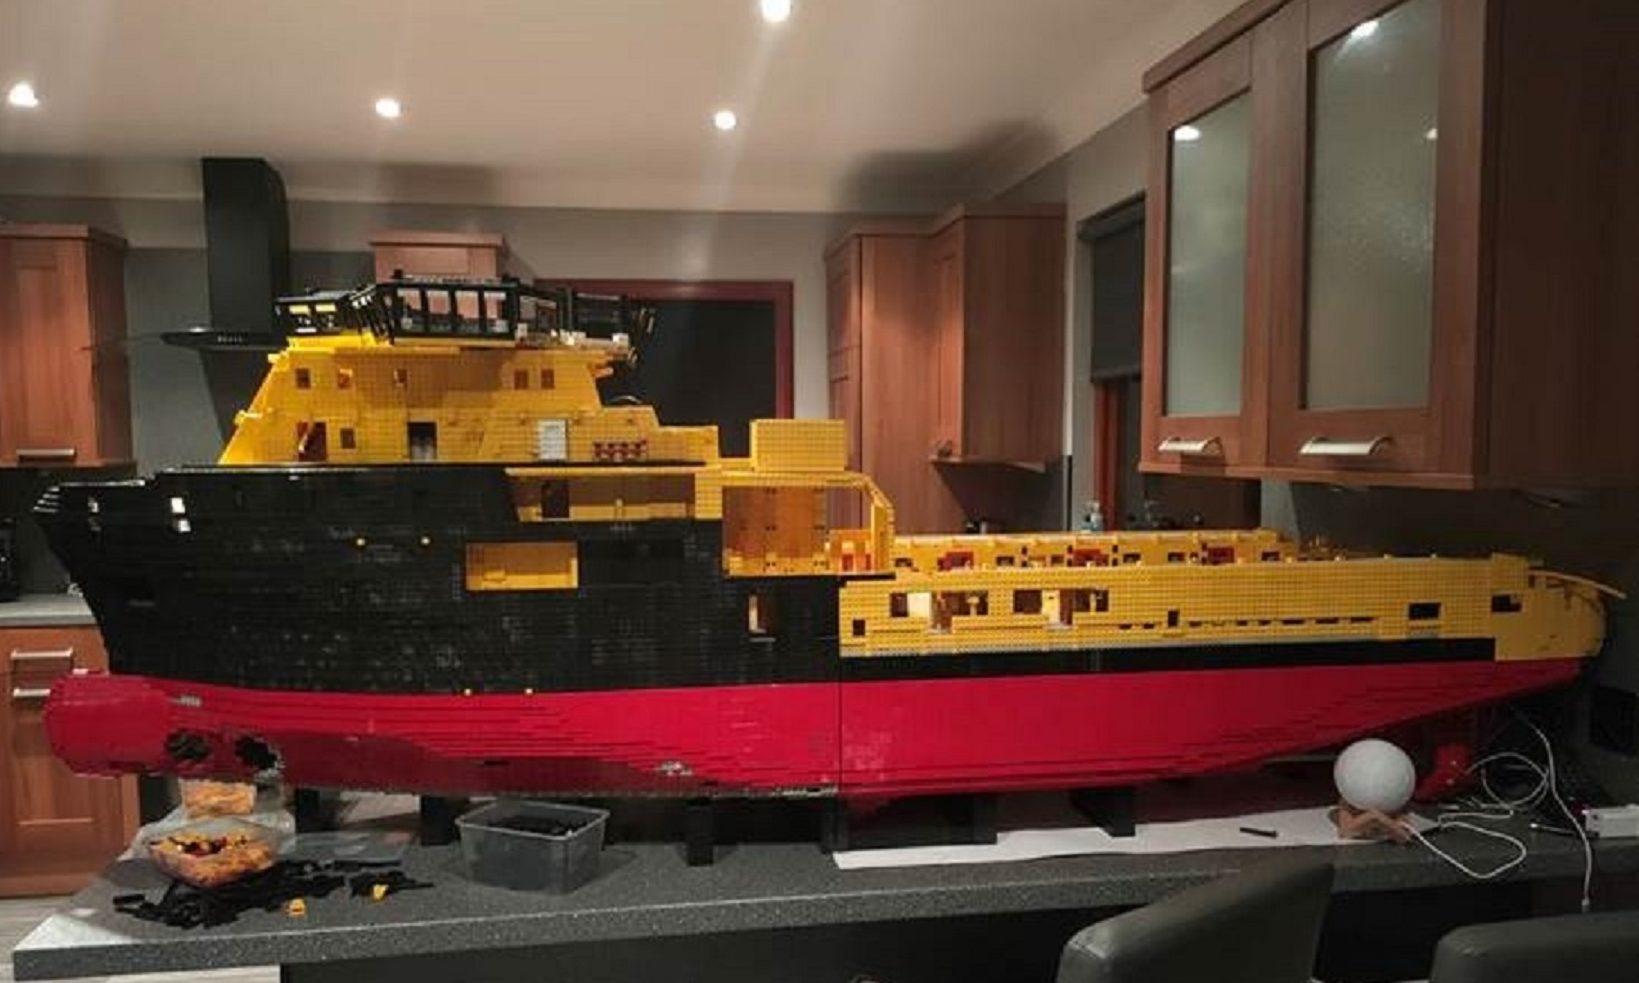 The seven-foot model ship has taken over Jim McDonough's kitchen worktop.